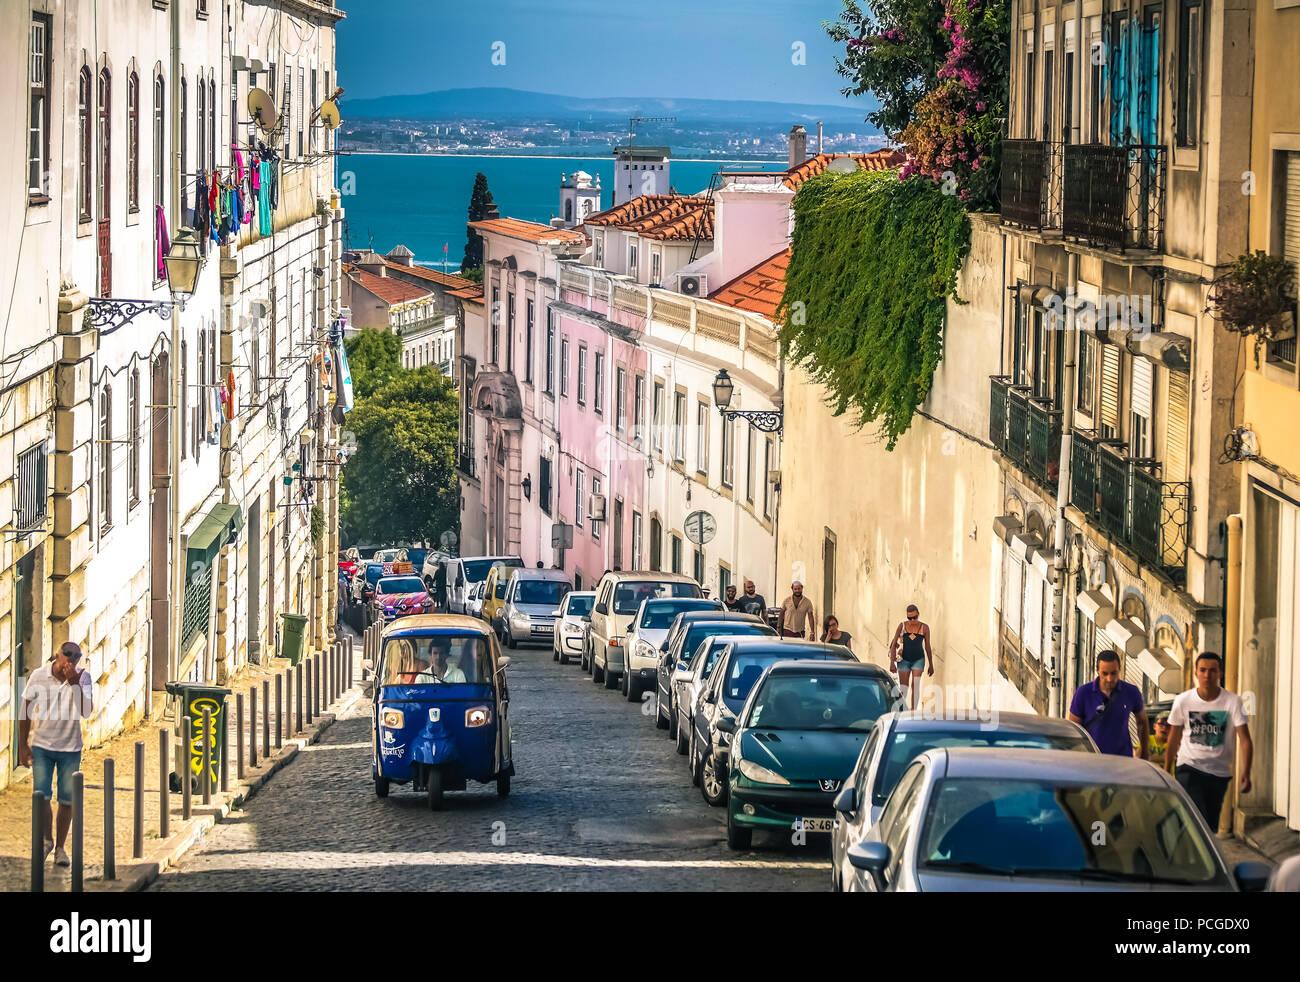 Lissabon. Ein Tuk-tuk der ersten Generation Bergauf klettern in Graça. Stockbild